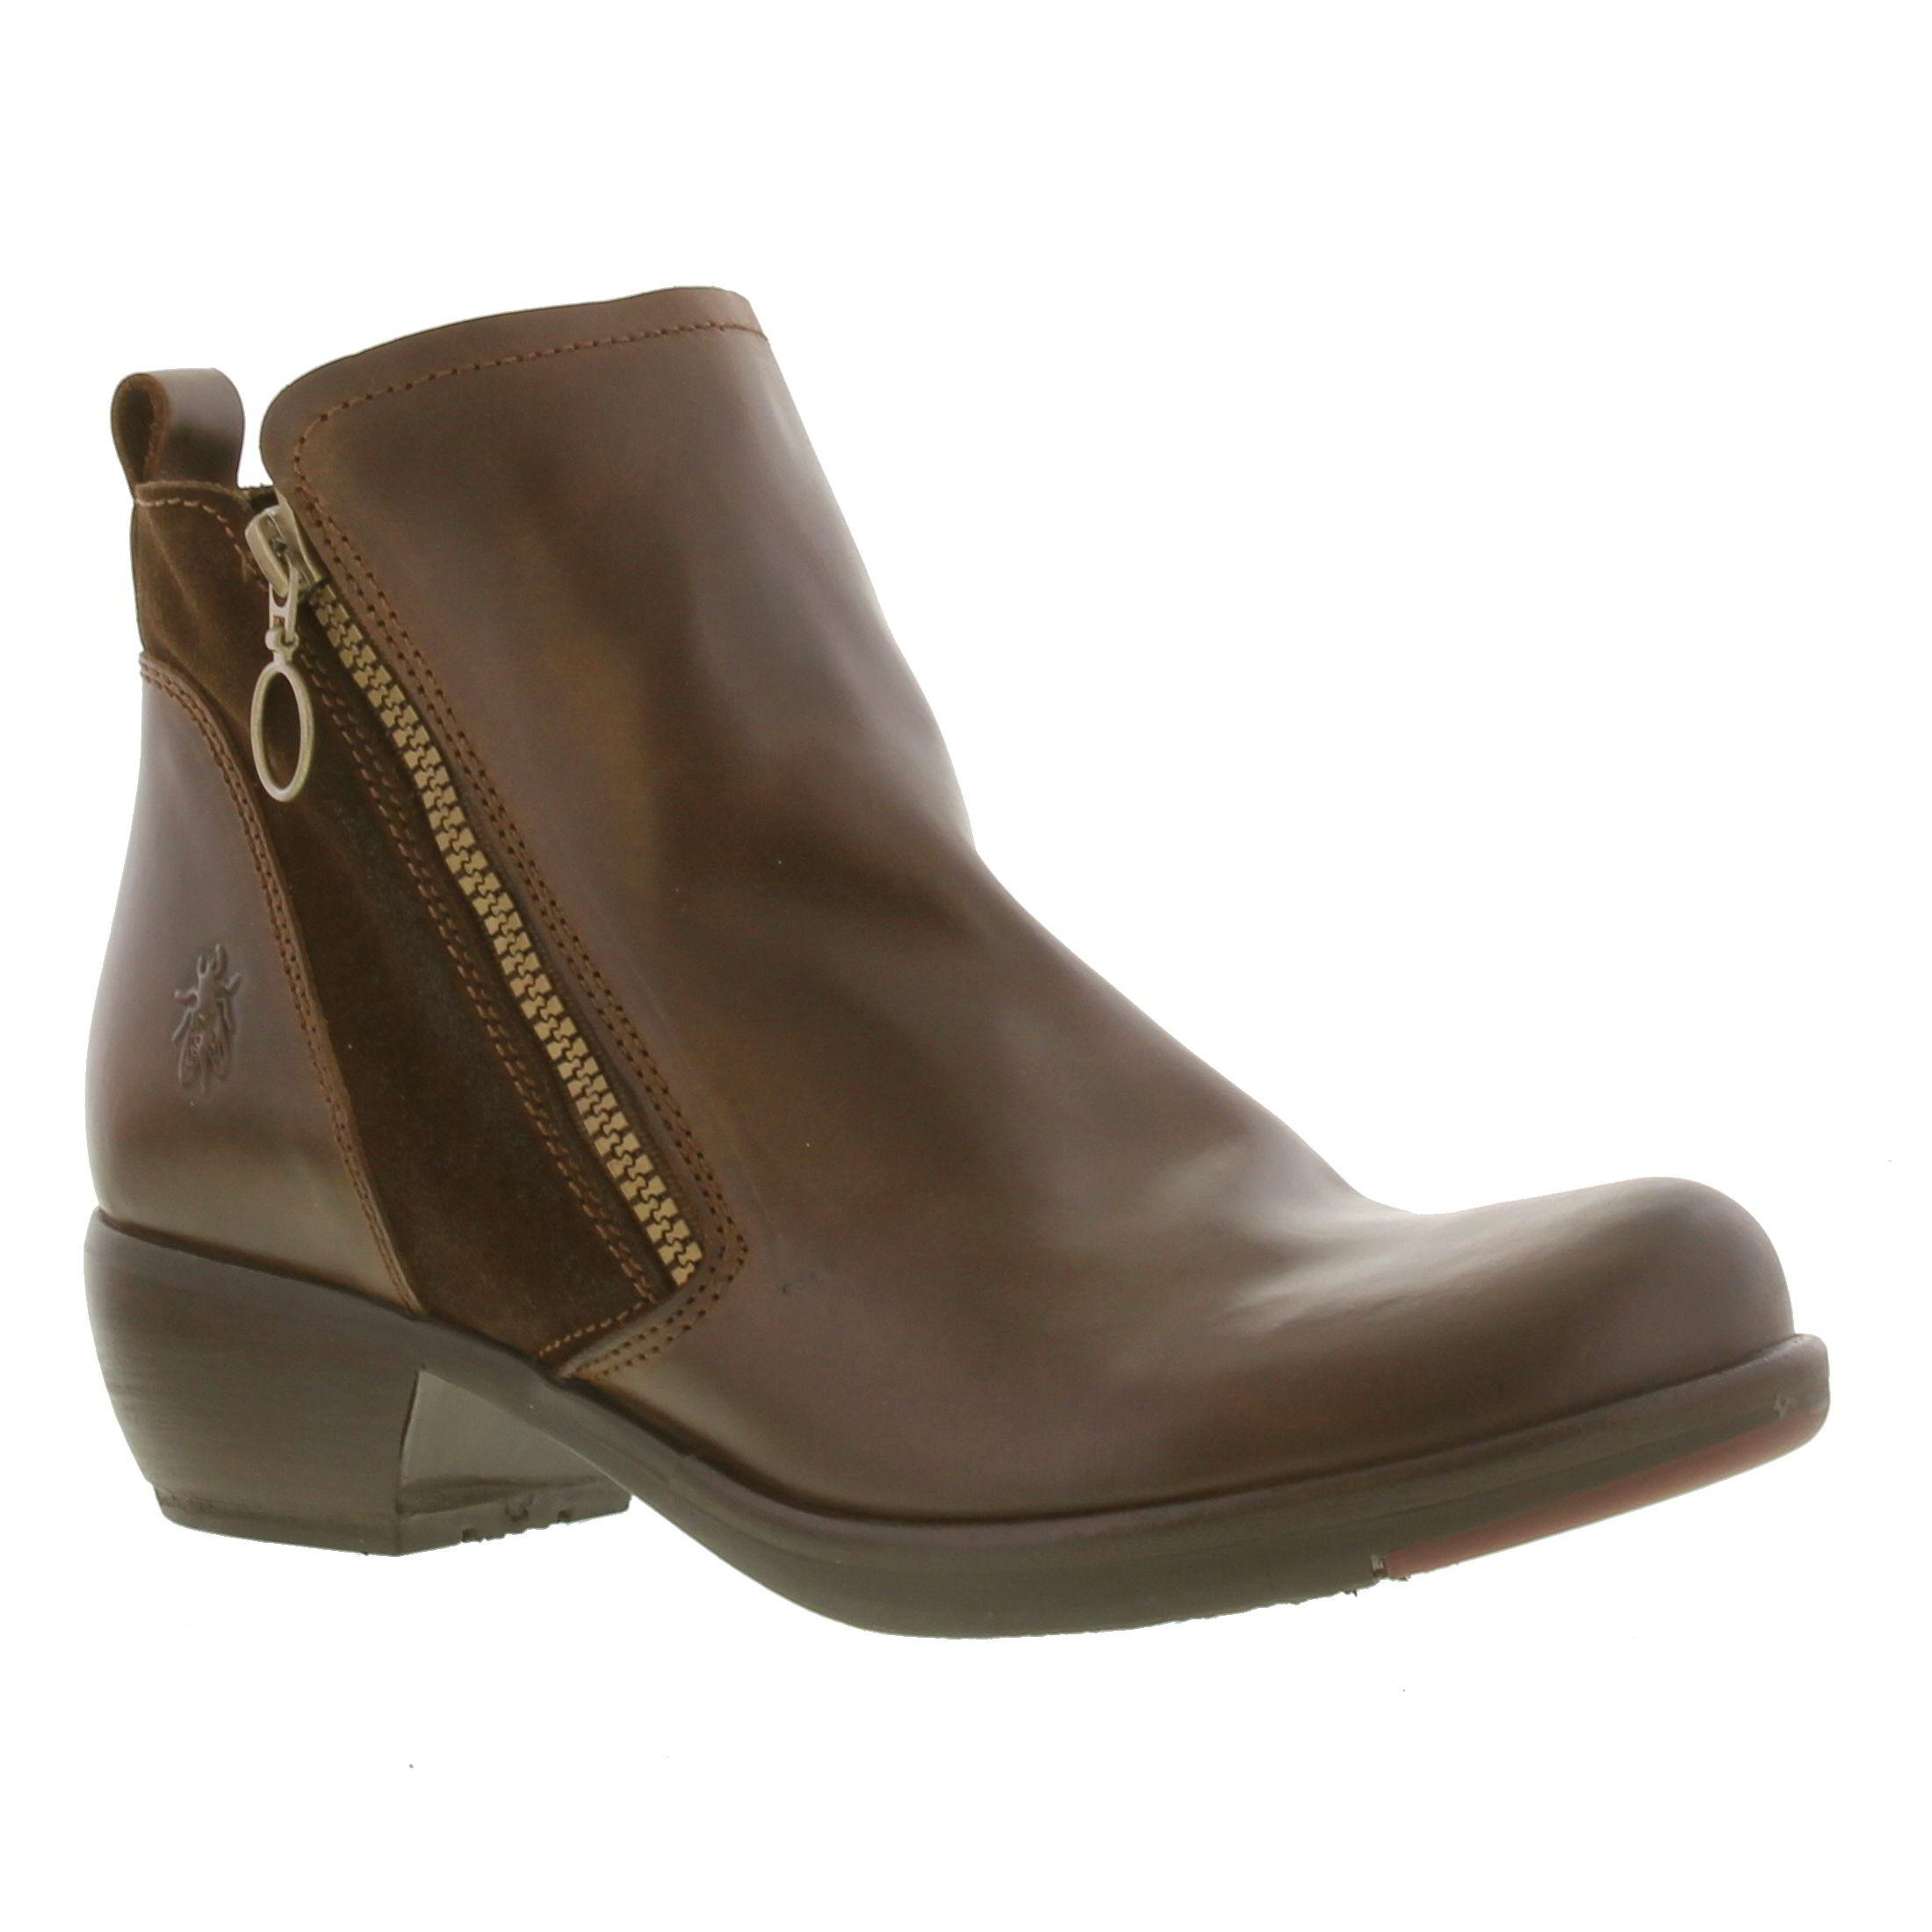 fly london meli womens black brown green leather ankle boots size uk 4 7 ebay. Black Bedroom Furniture Sets. Home Design Ideas